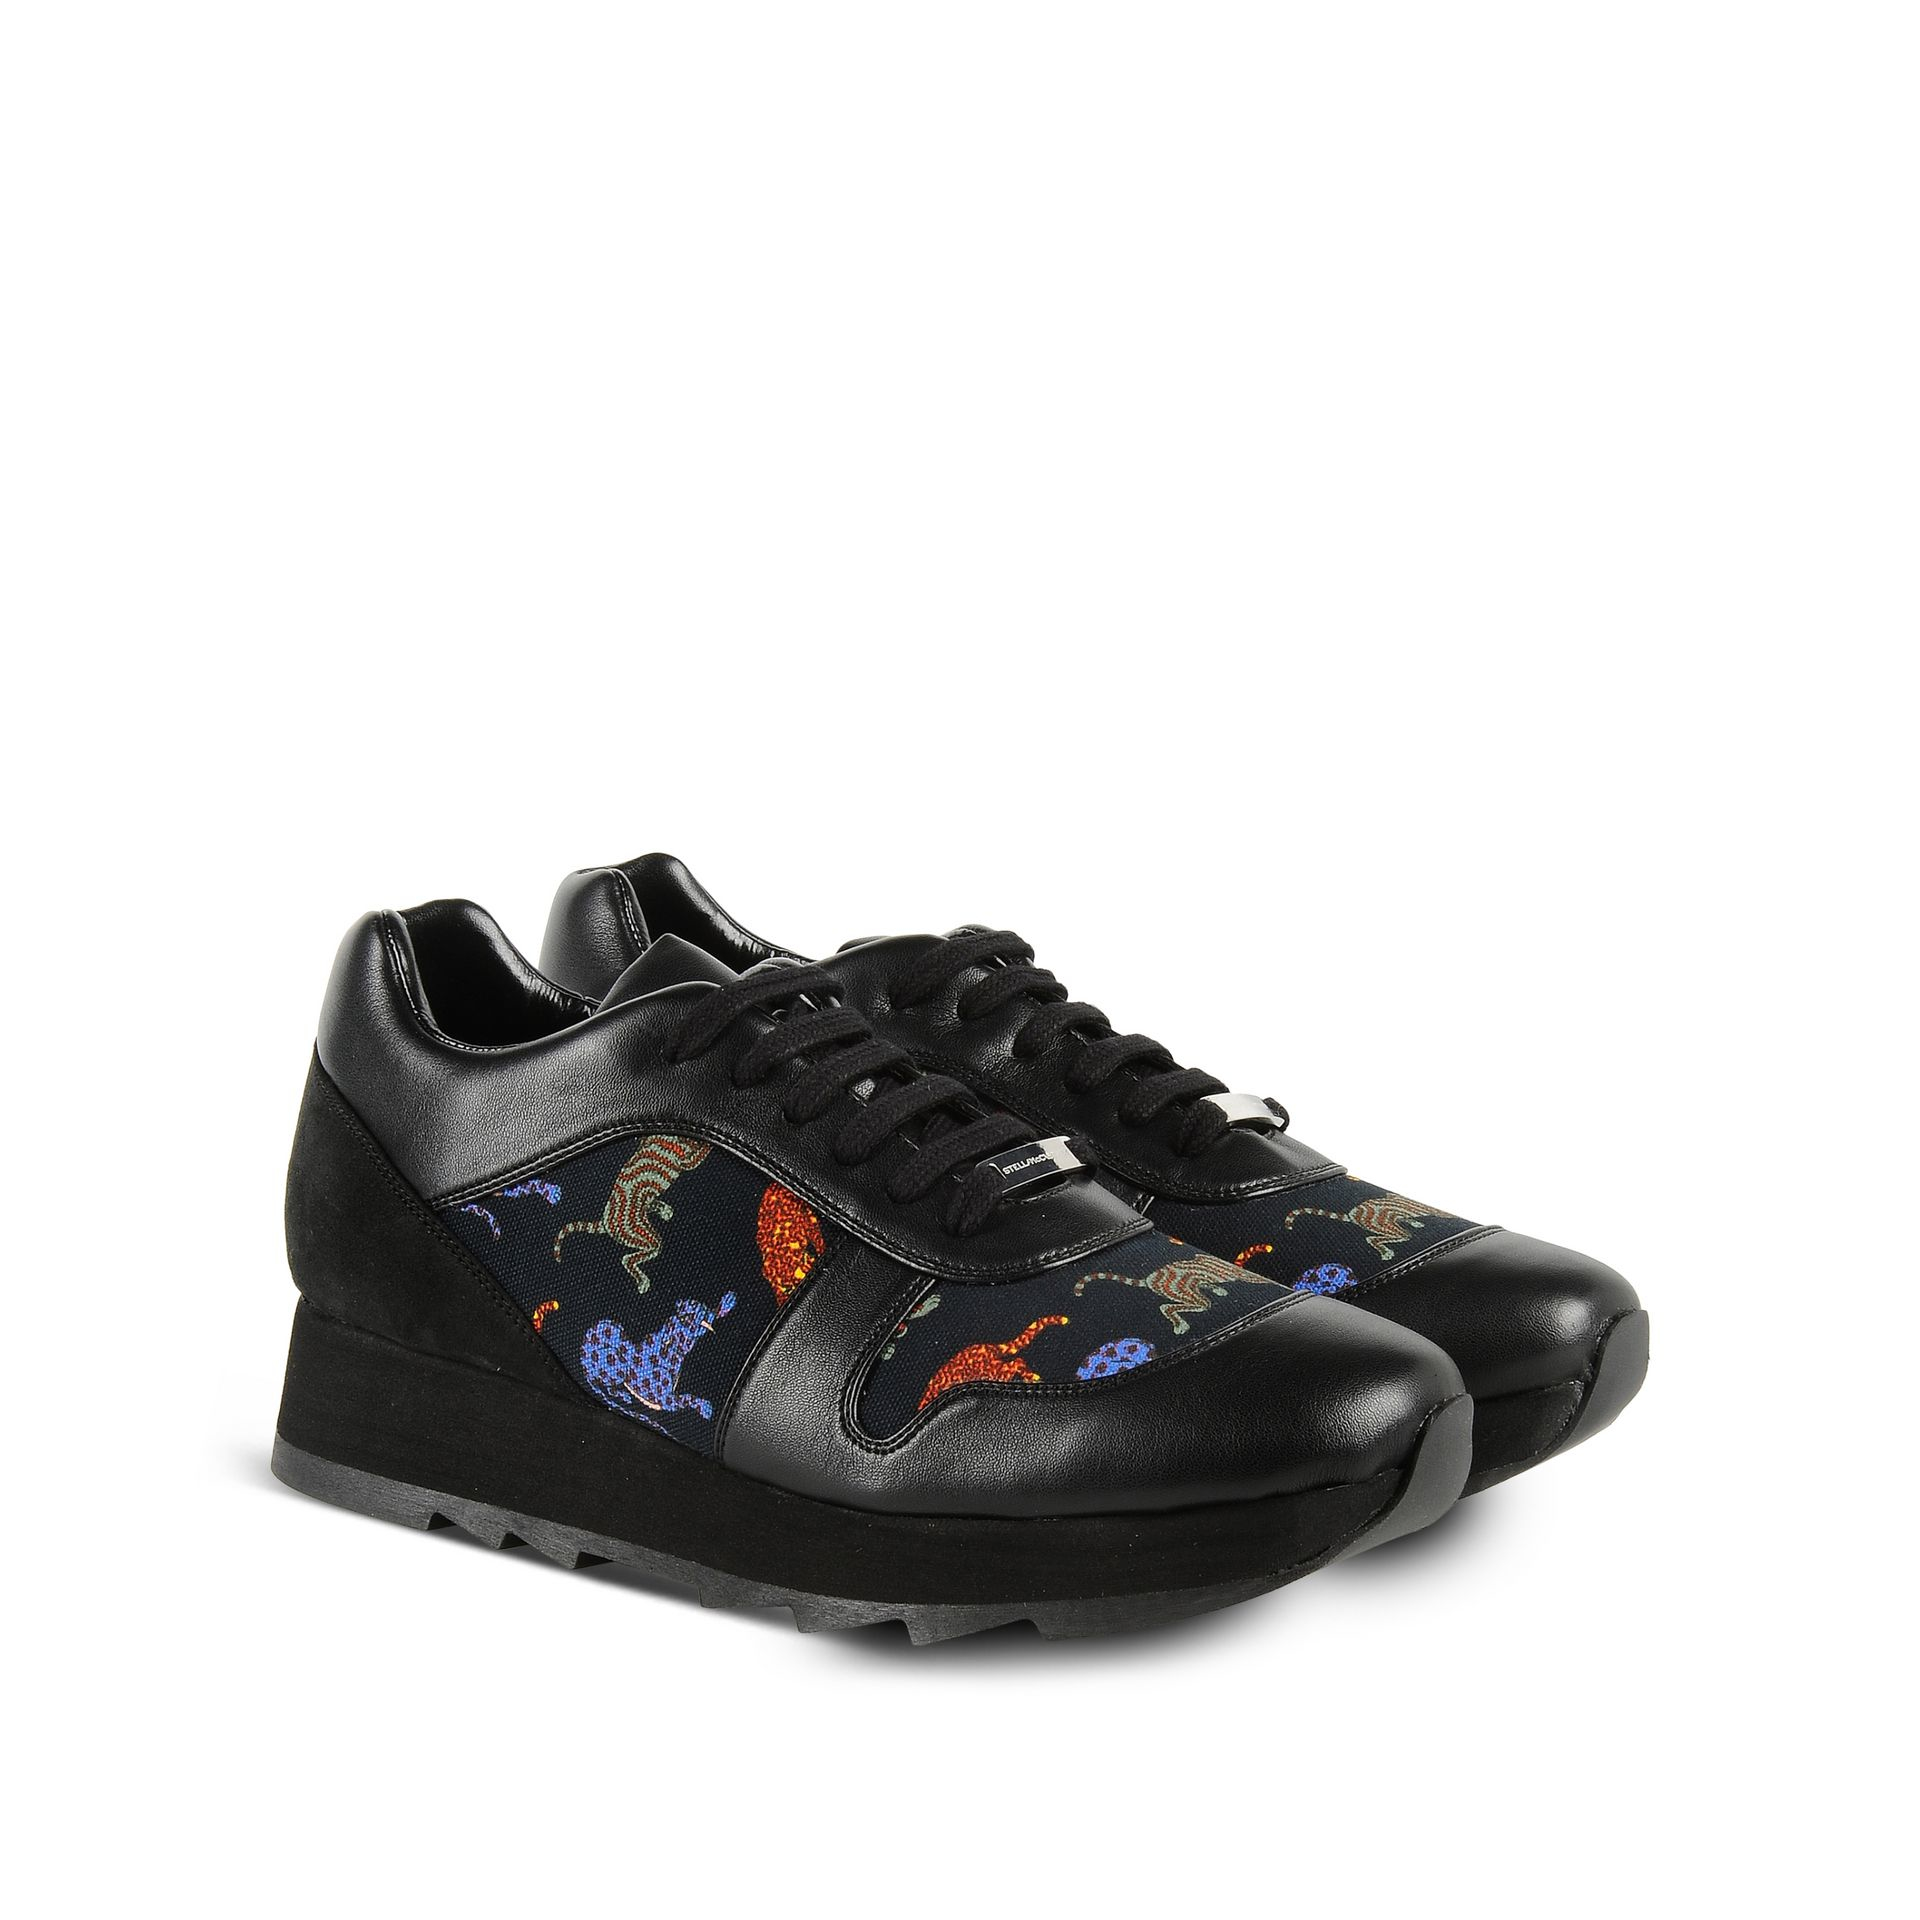 Stella McCartney Lace Macy Crouching Cat Sneakers in Black